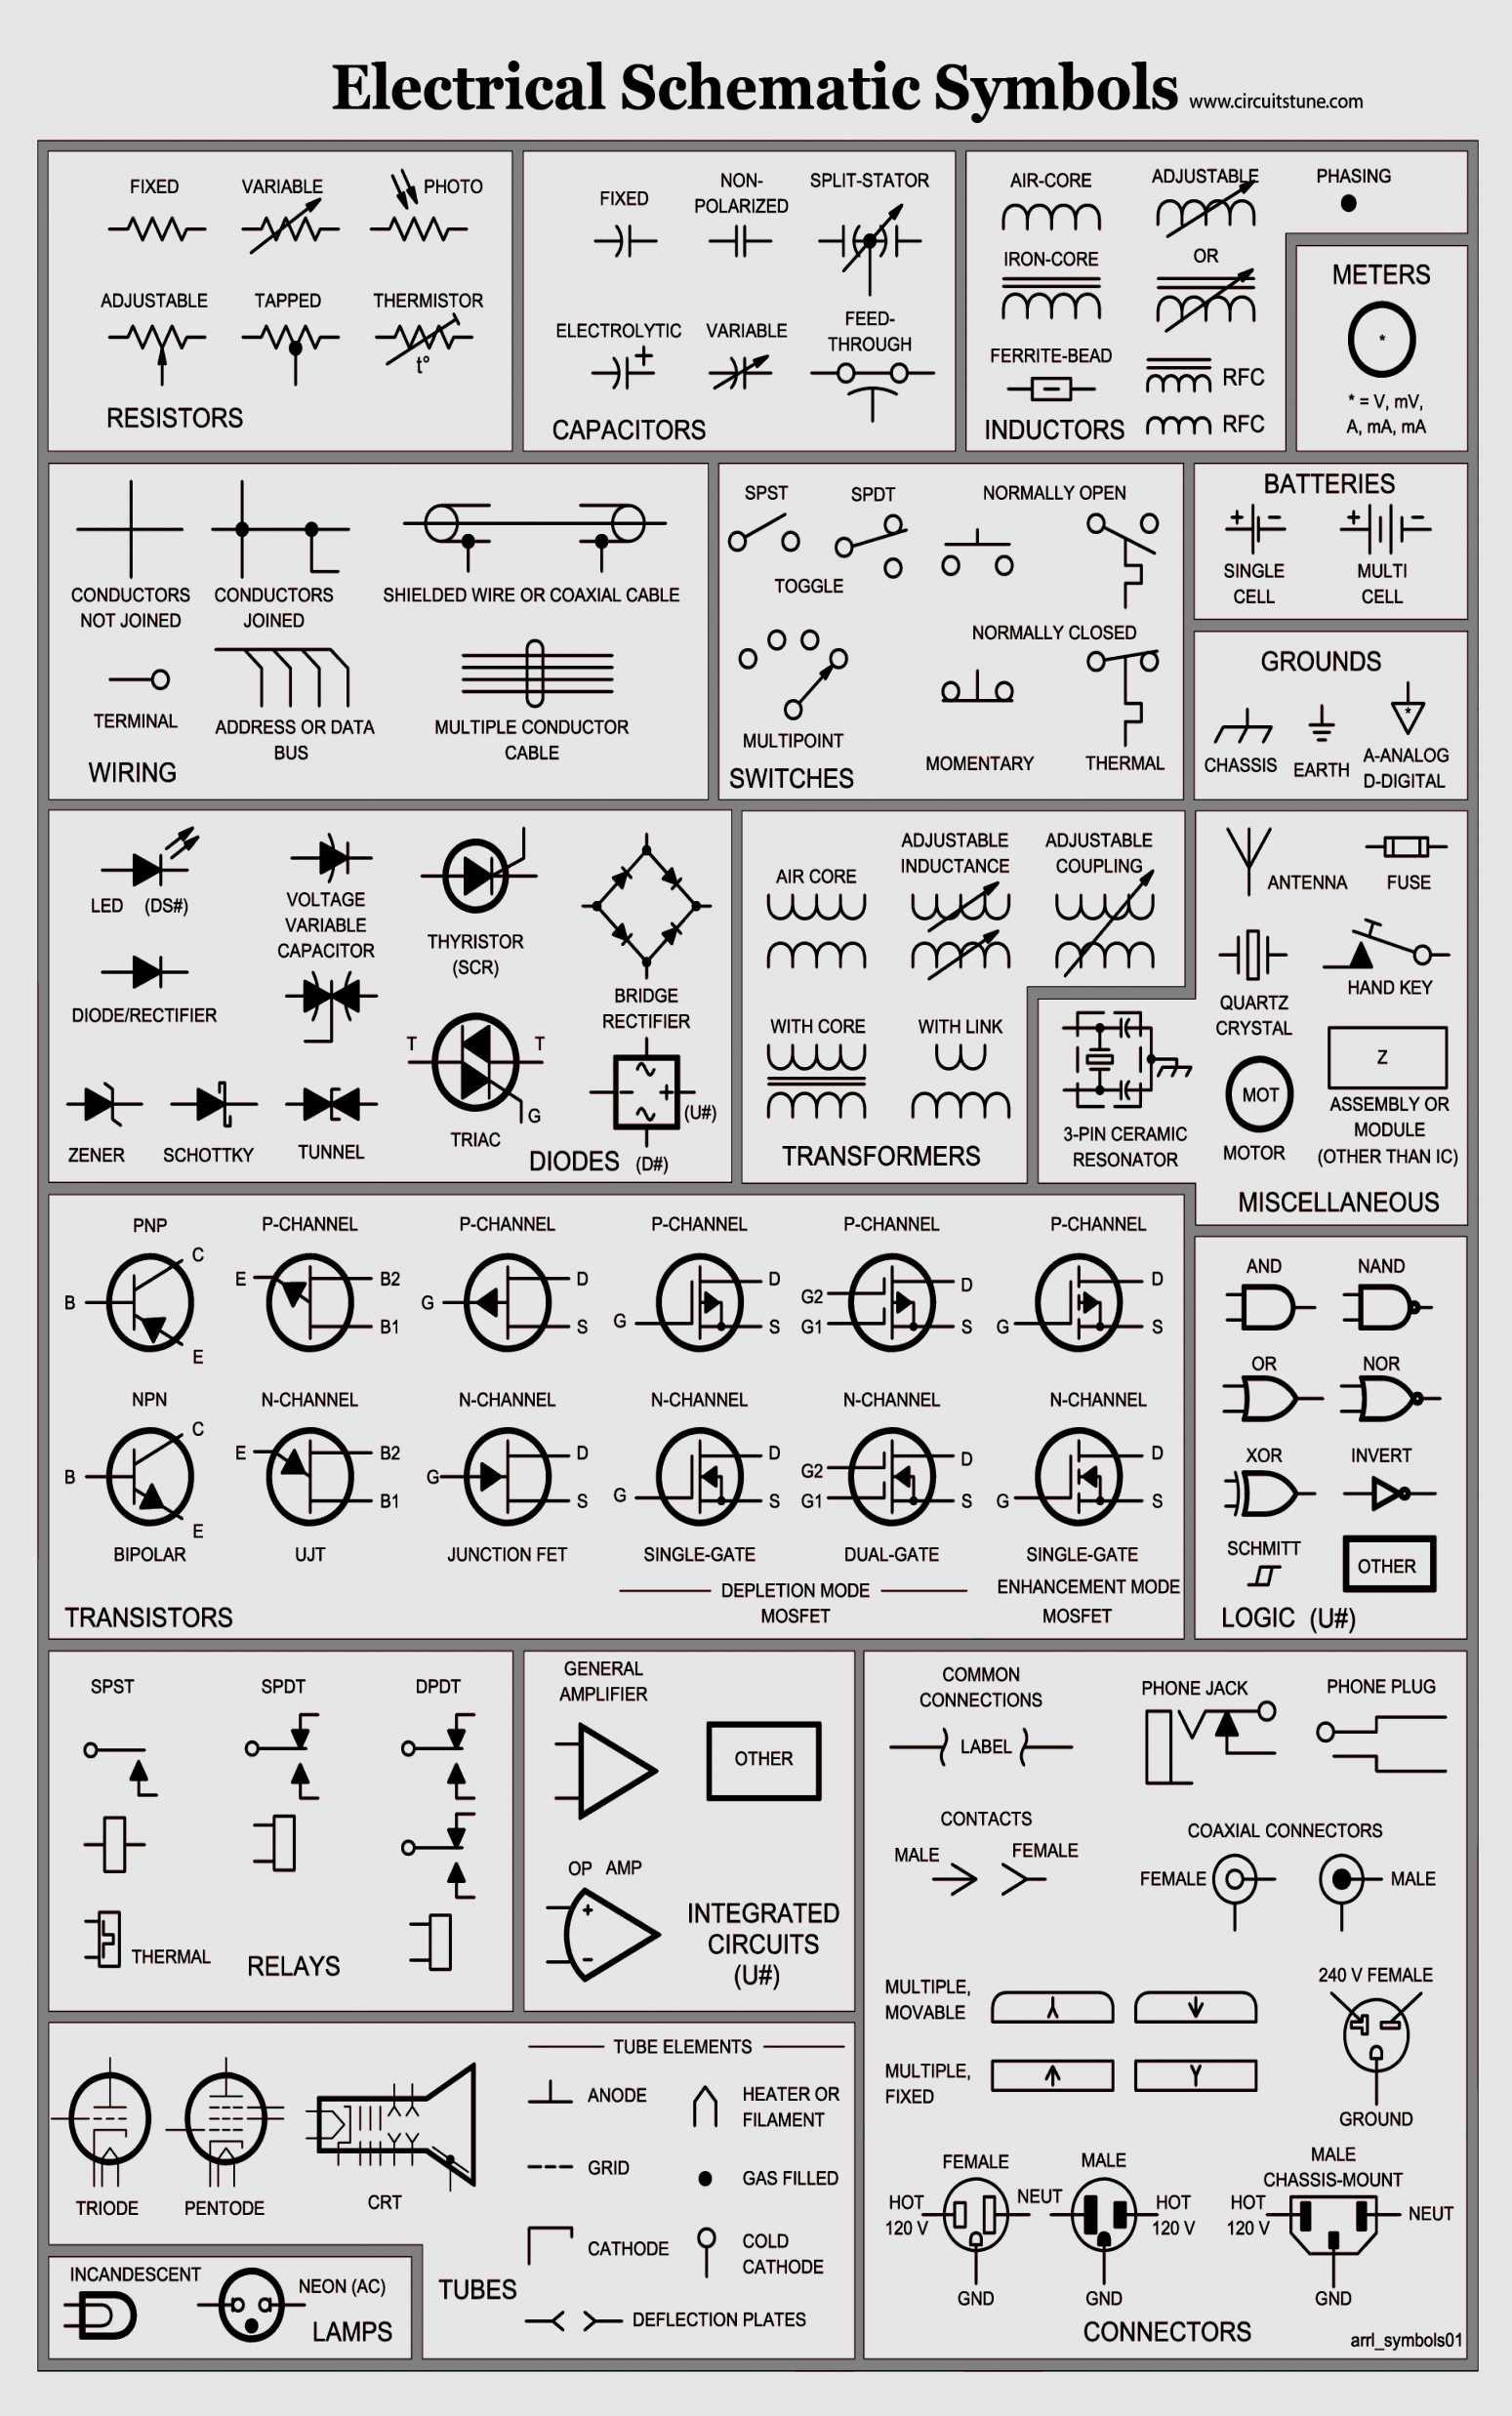 Air Conditioner Wiring Diagram Pdf - Wiring Diagrams - Air Conditioner Wiring Diagram Pdf